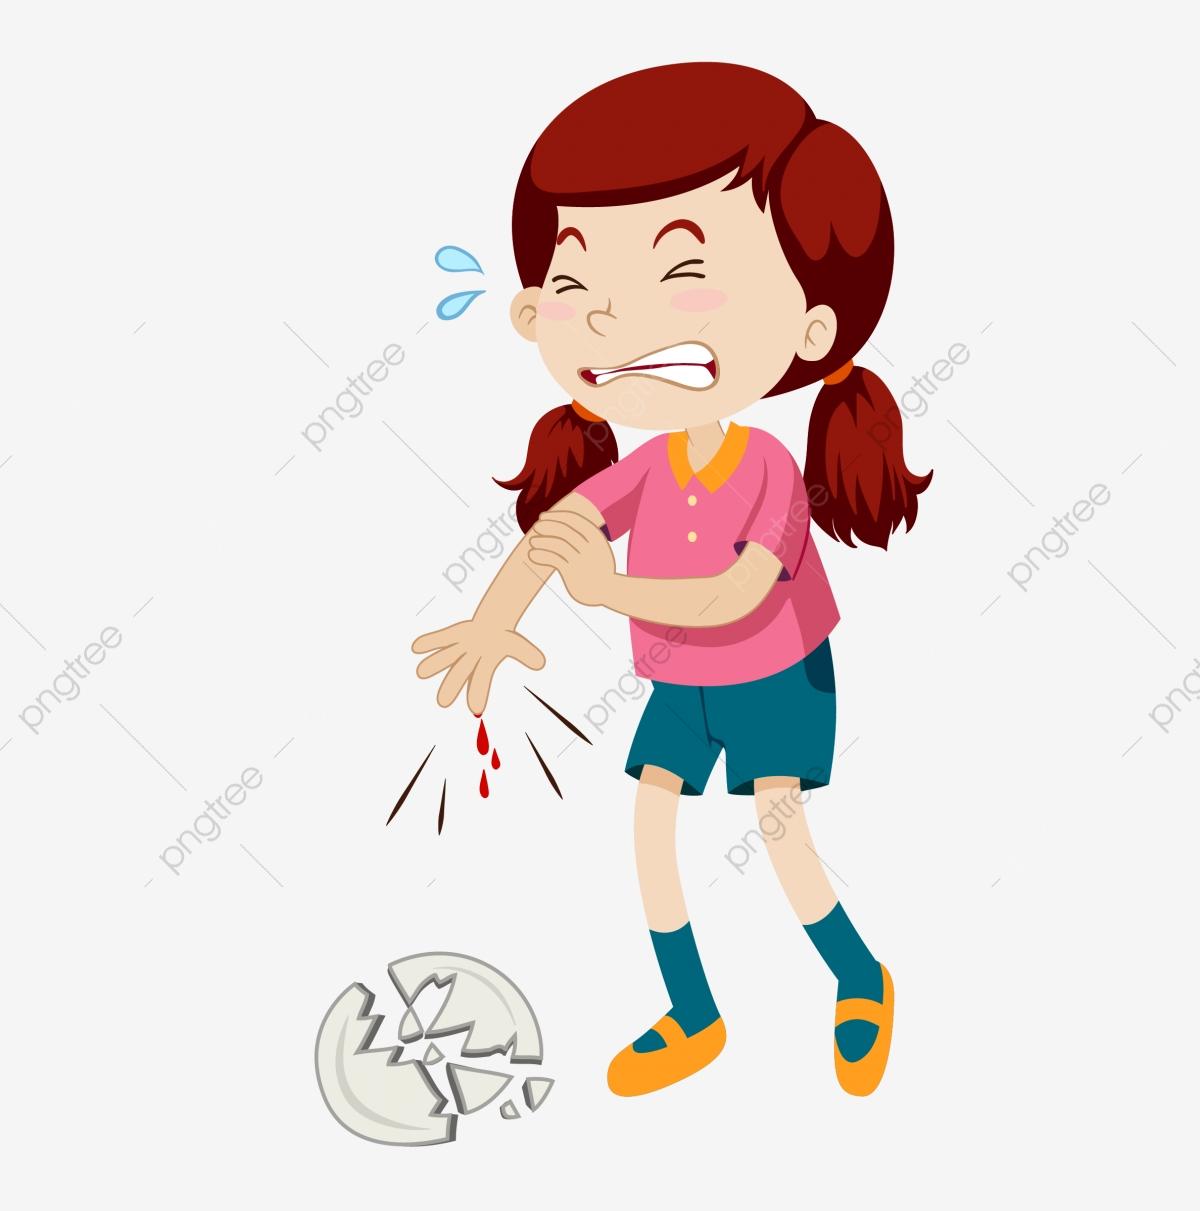 Arm Arm Injury Injured Injured And Crying, Cry, Crying Girl.